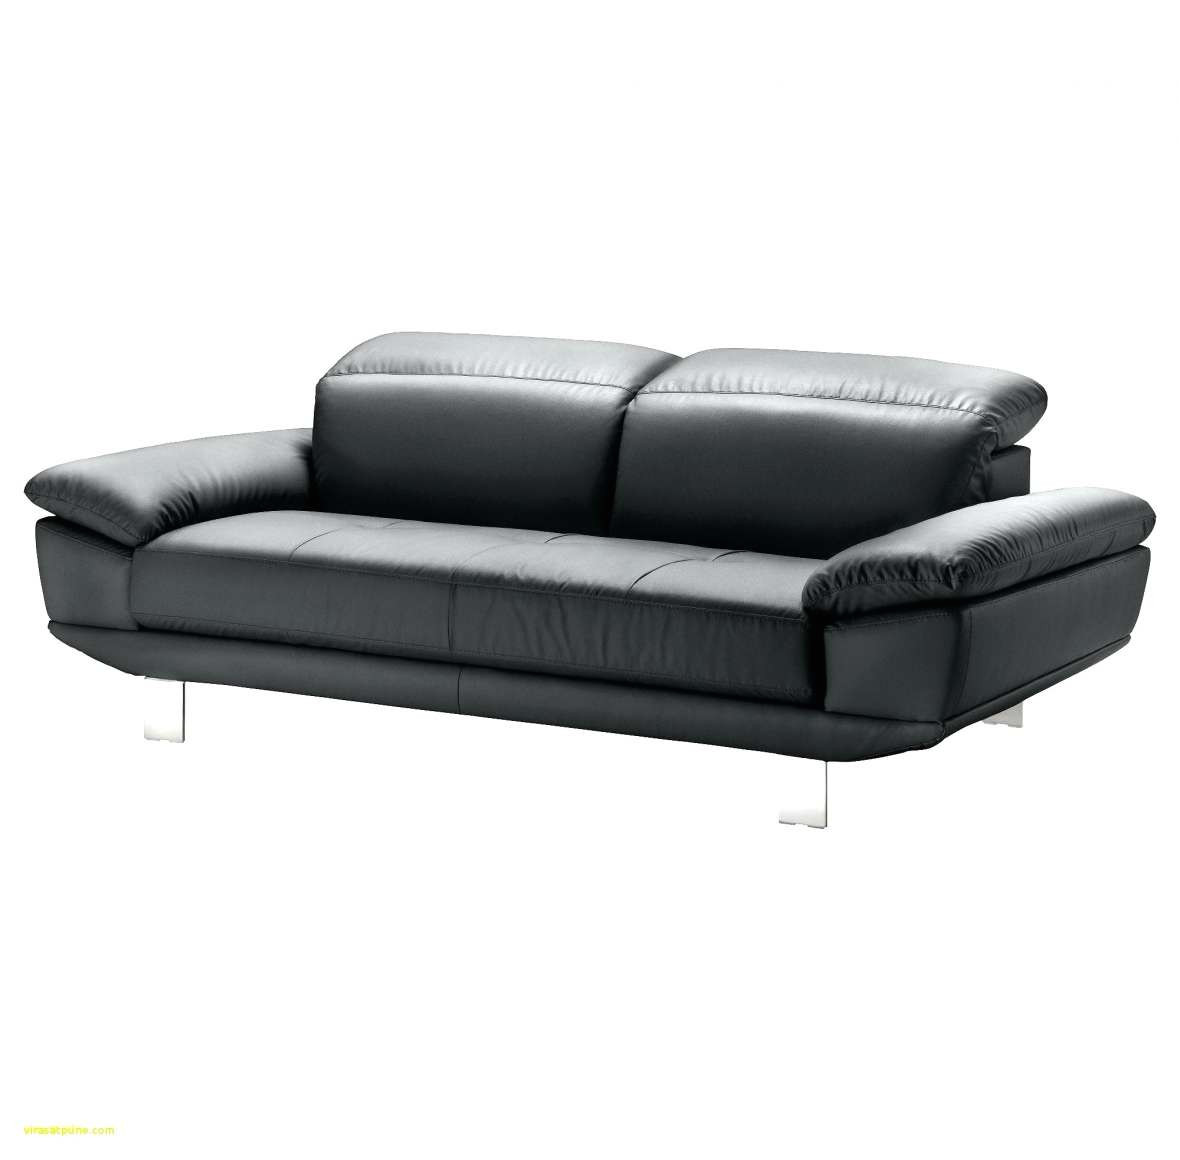 convertable sofa and canape tissu convertible canapes design new canapes design 0d